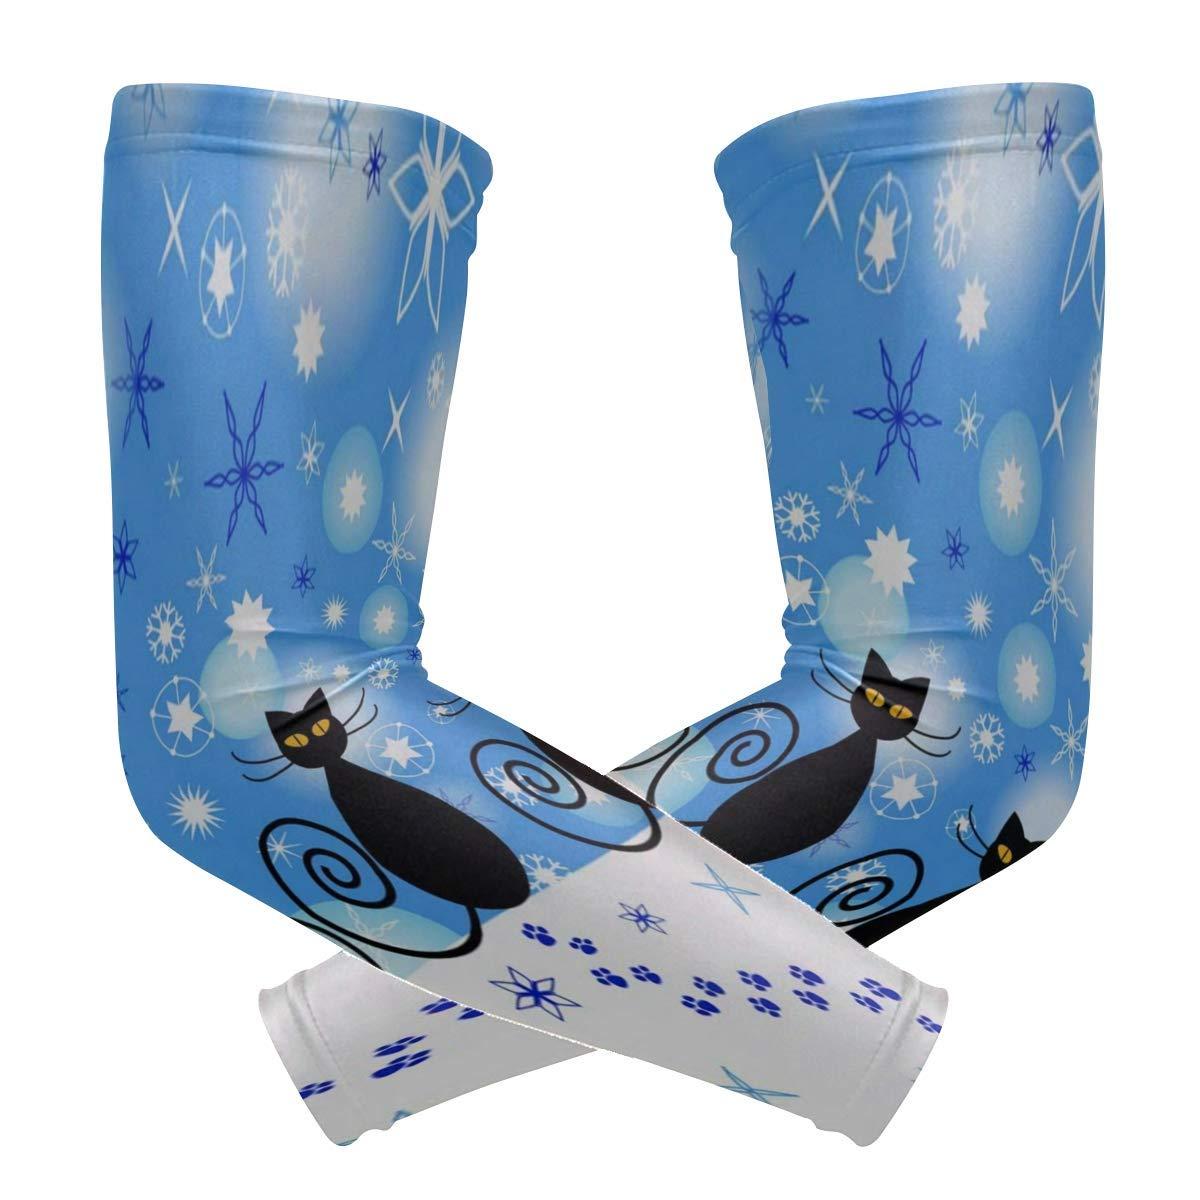 Arm Sleeves Fairytale Whale Moon Star Mushroom Mens Sun UV Protection Sleeves Arm Warmers Cool Long Set Covers White